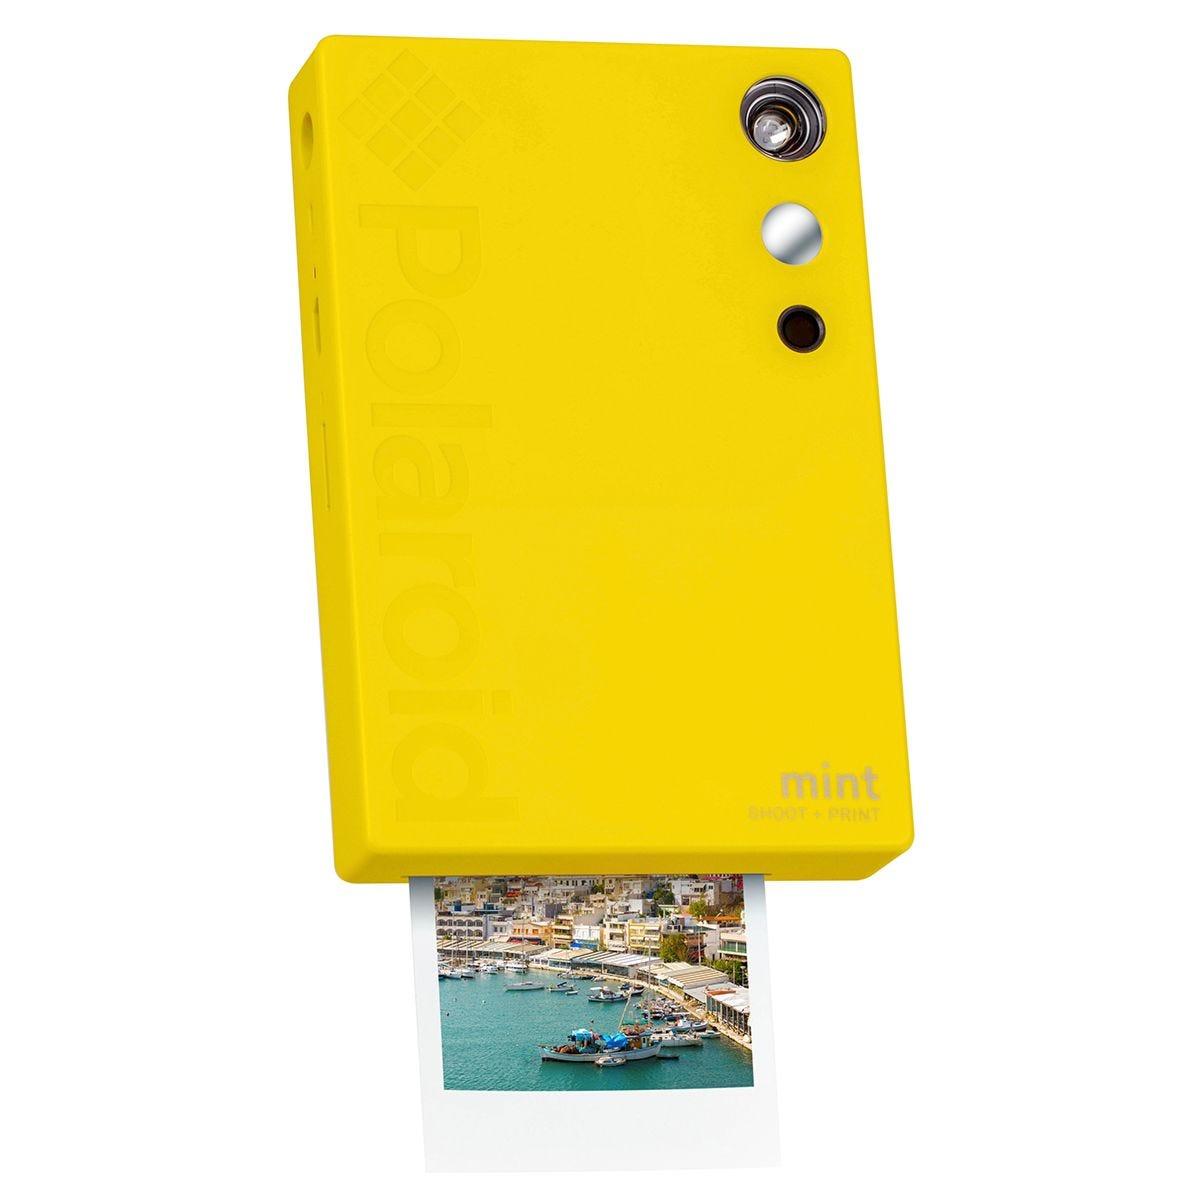 Polaroid Mint Instant Digital Camera - Yellow